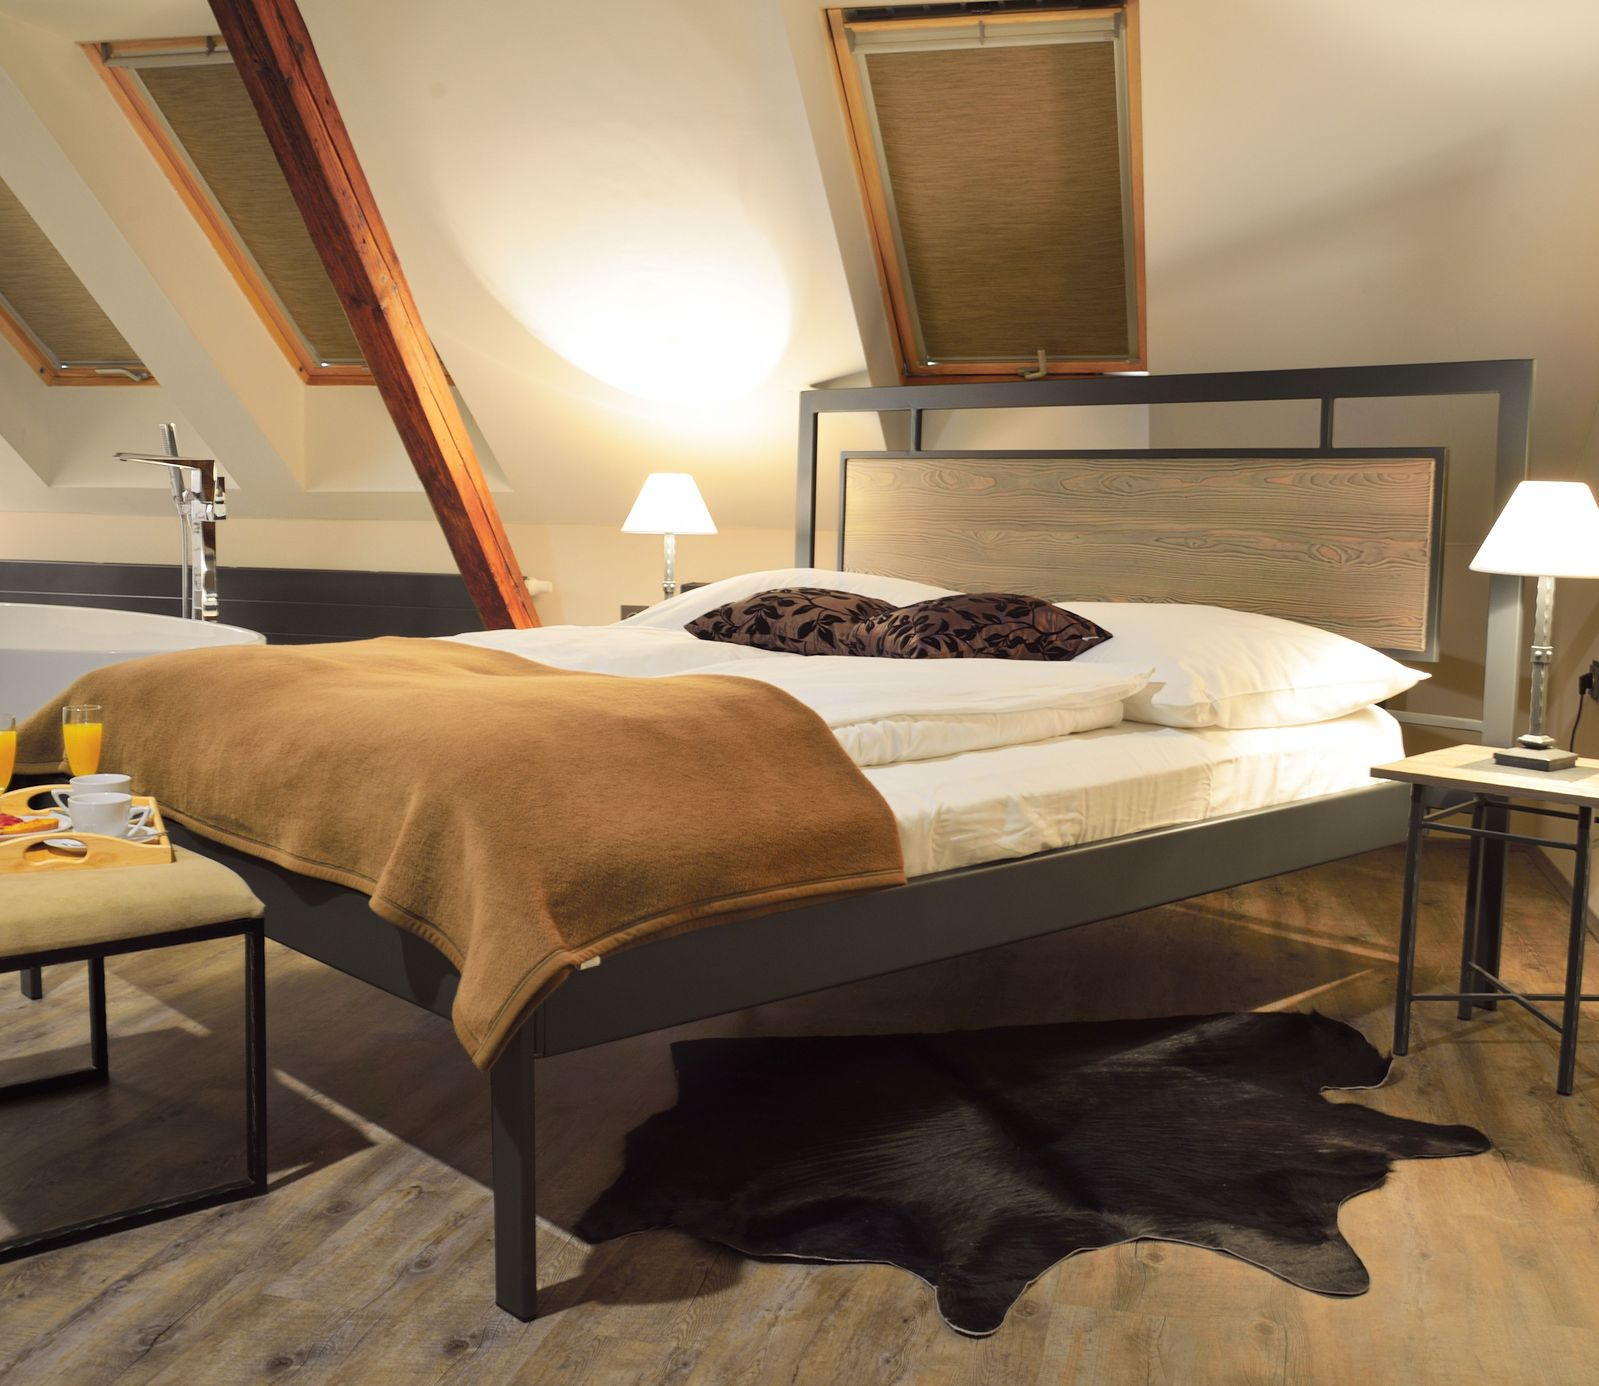 modernes metallbett ohne fu teil z b in wei tarvisio. Black Bedroom Furniture Sets. Home Design Ideas